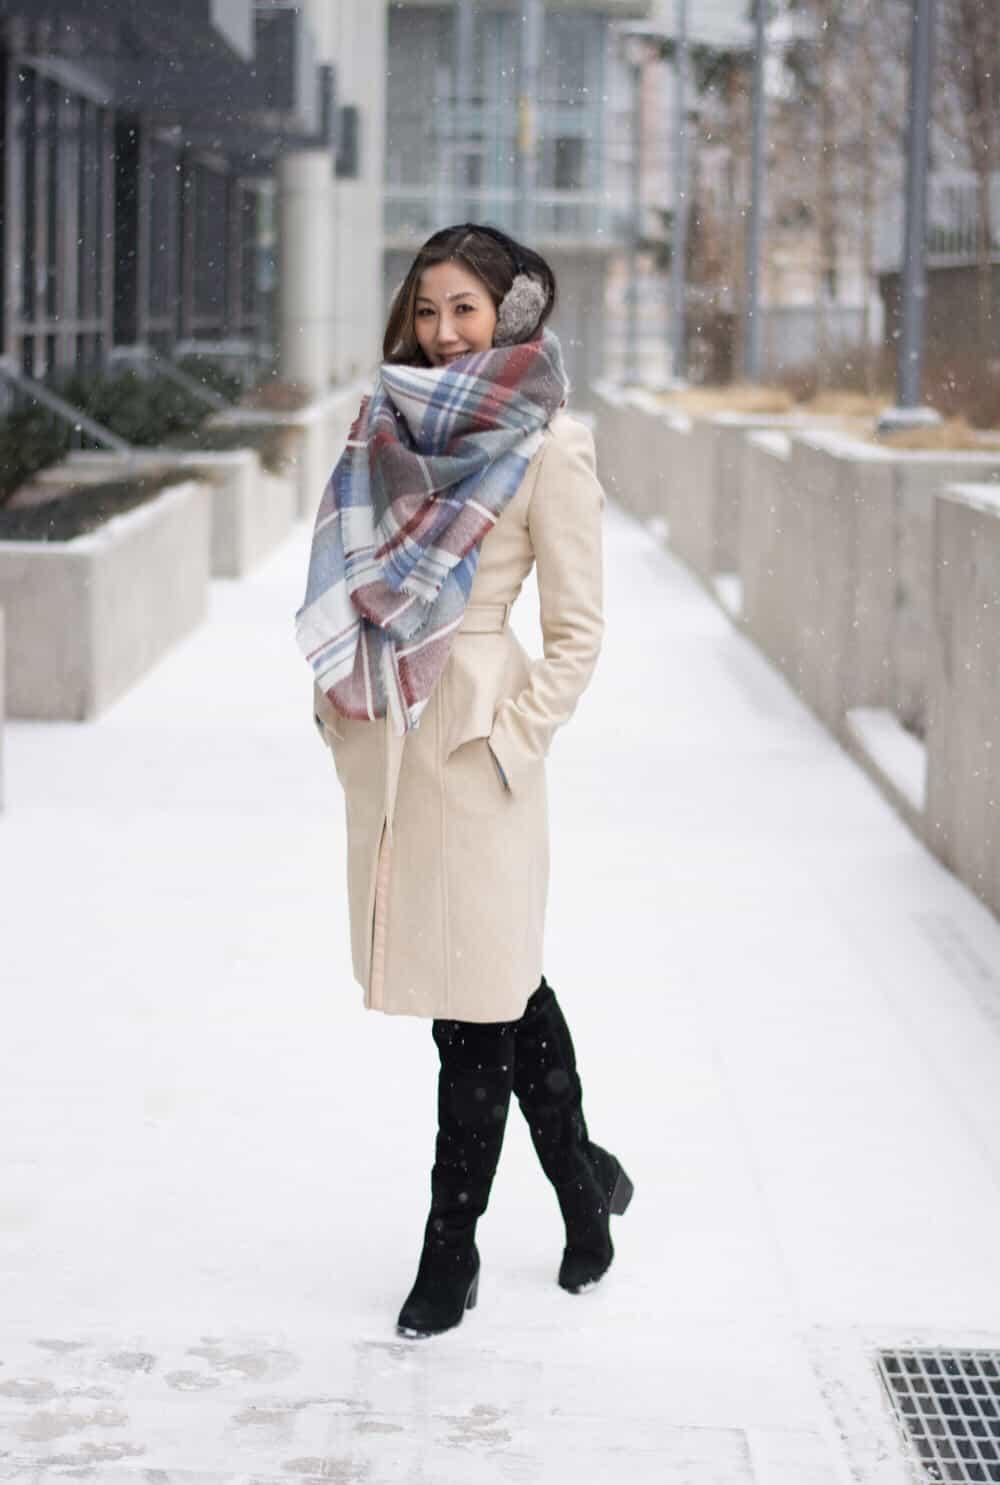 Cosy Winter look: zara scarf and hm wool coat, fur ear muffs.